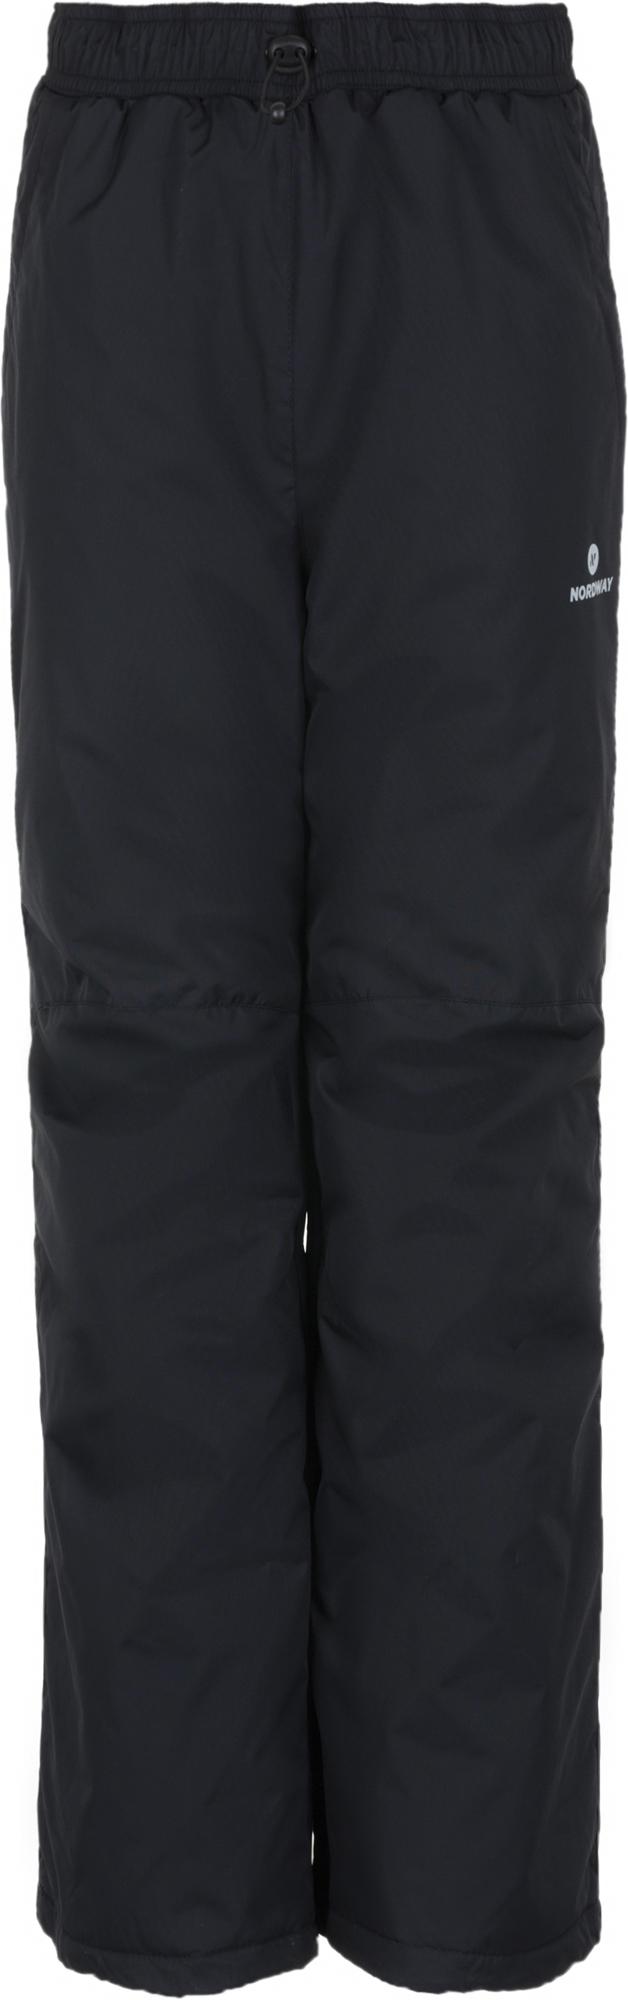 Nordway Брюки для девочек Nordway, размер 146 nordway ботинки для беговых лыж nordway tromse размер 44